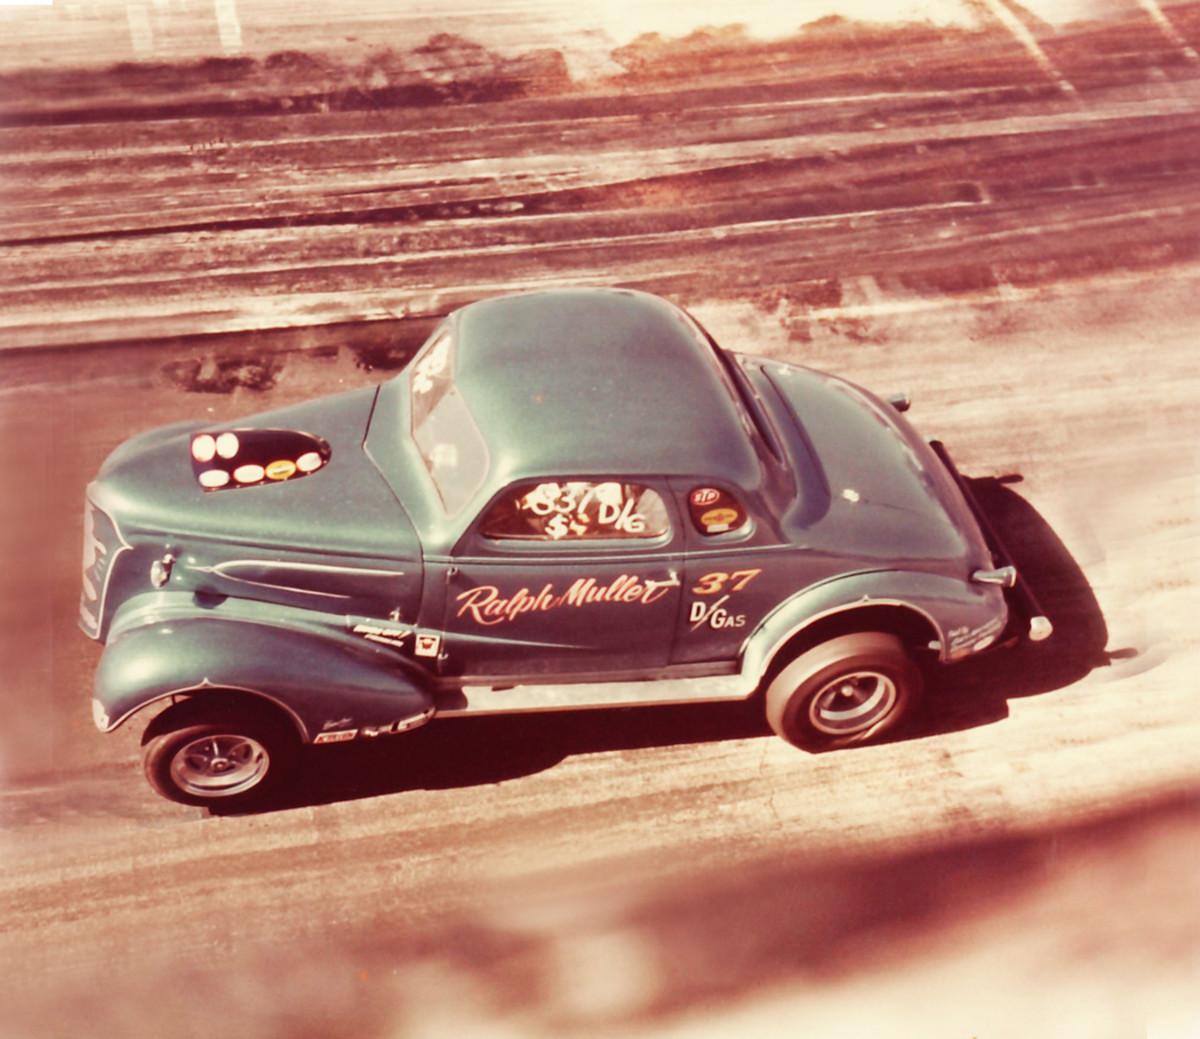 The homebuilt 1937 Chevrolet D/Gas coupe